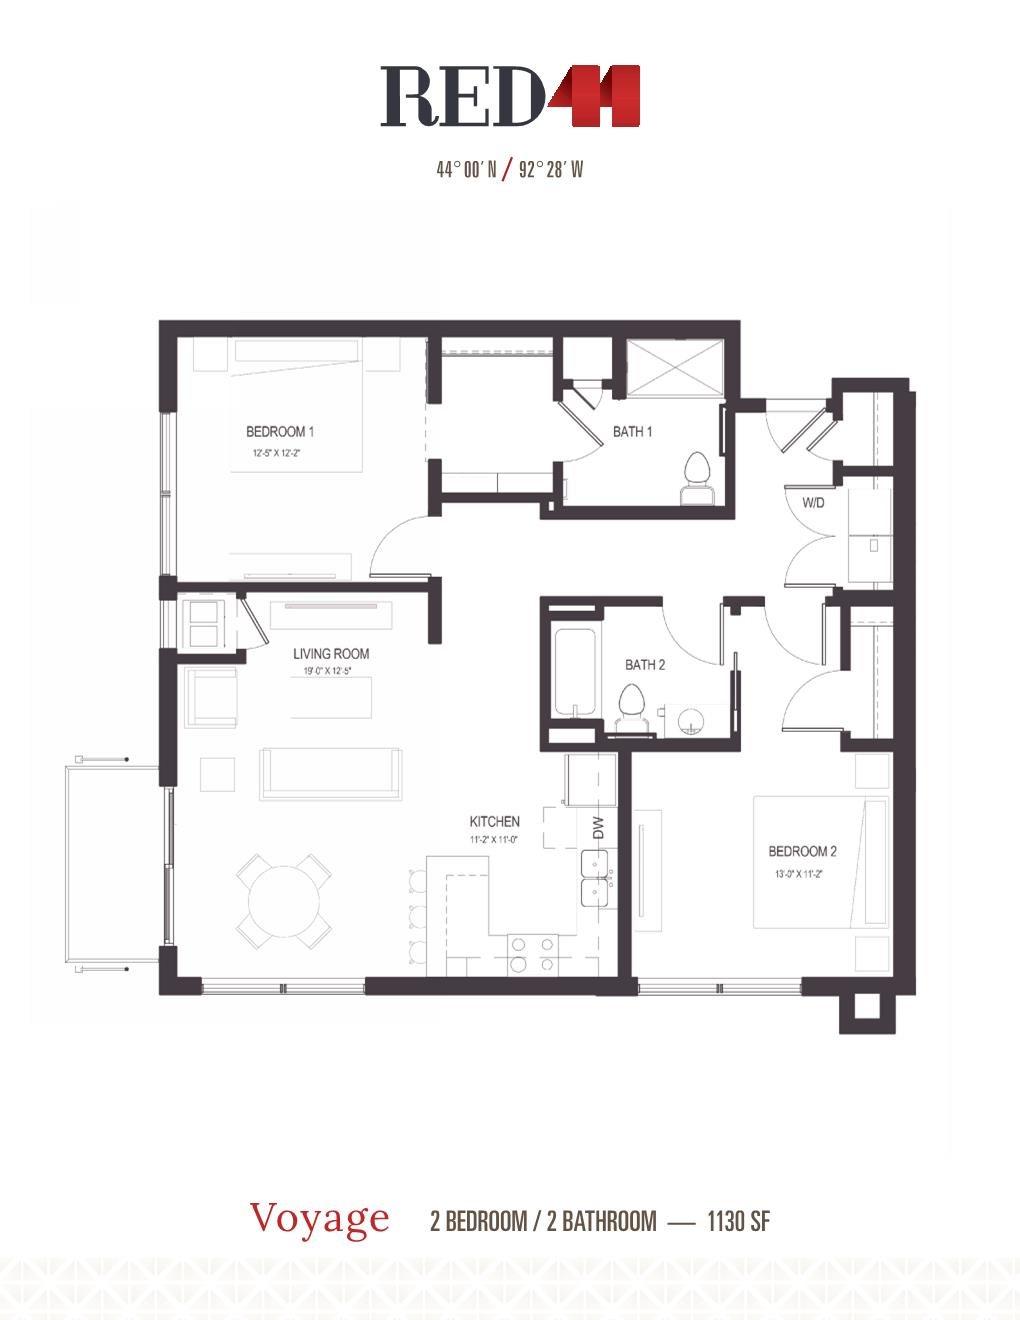 Voyage Floor Plan 13